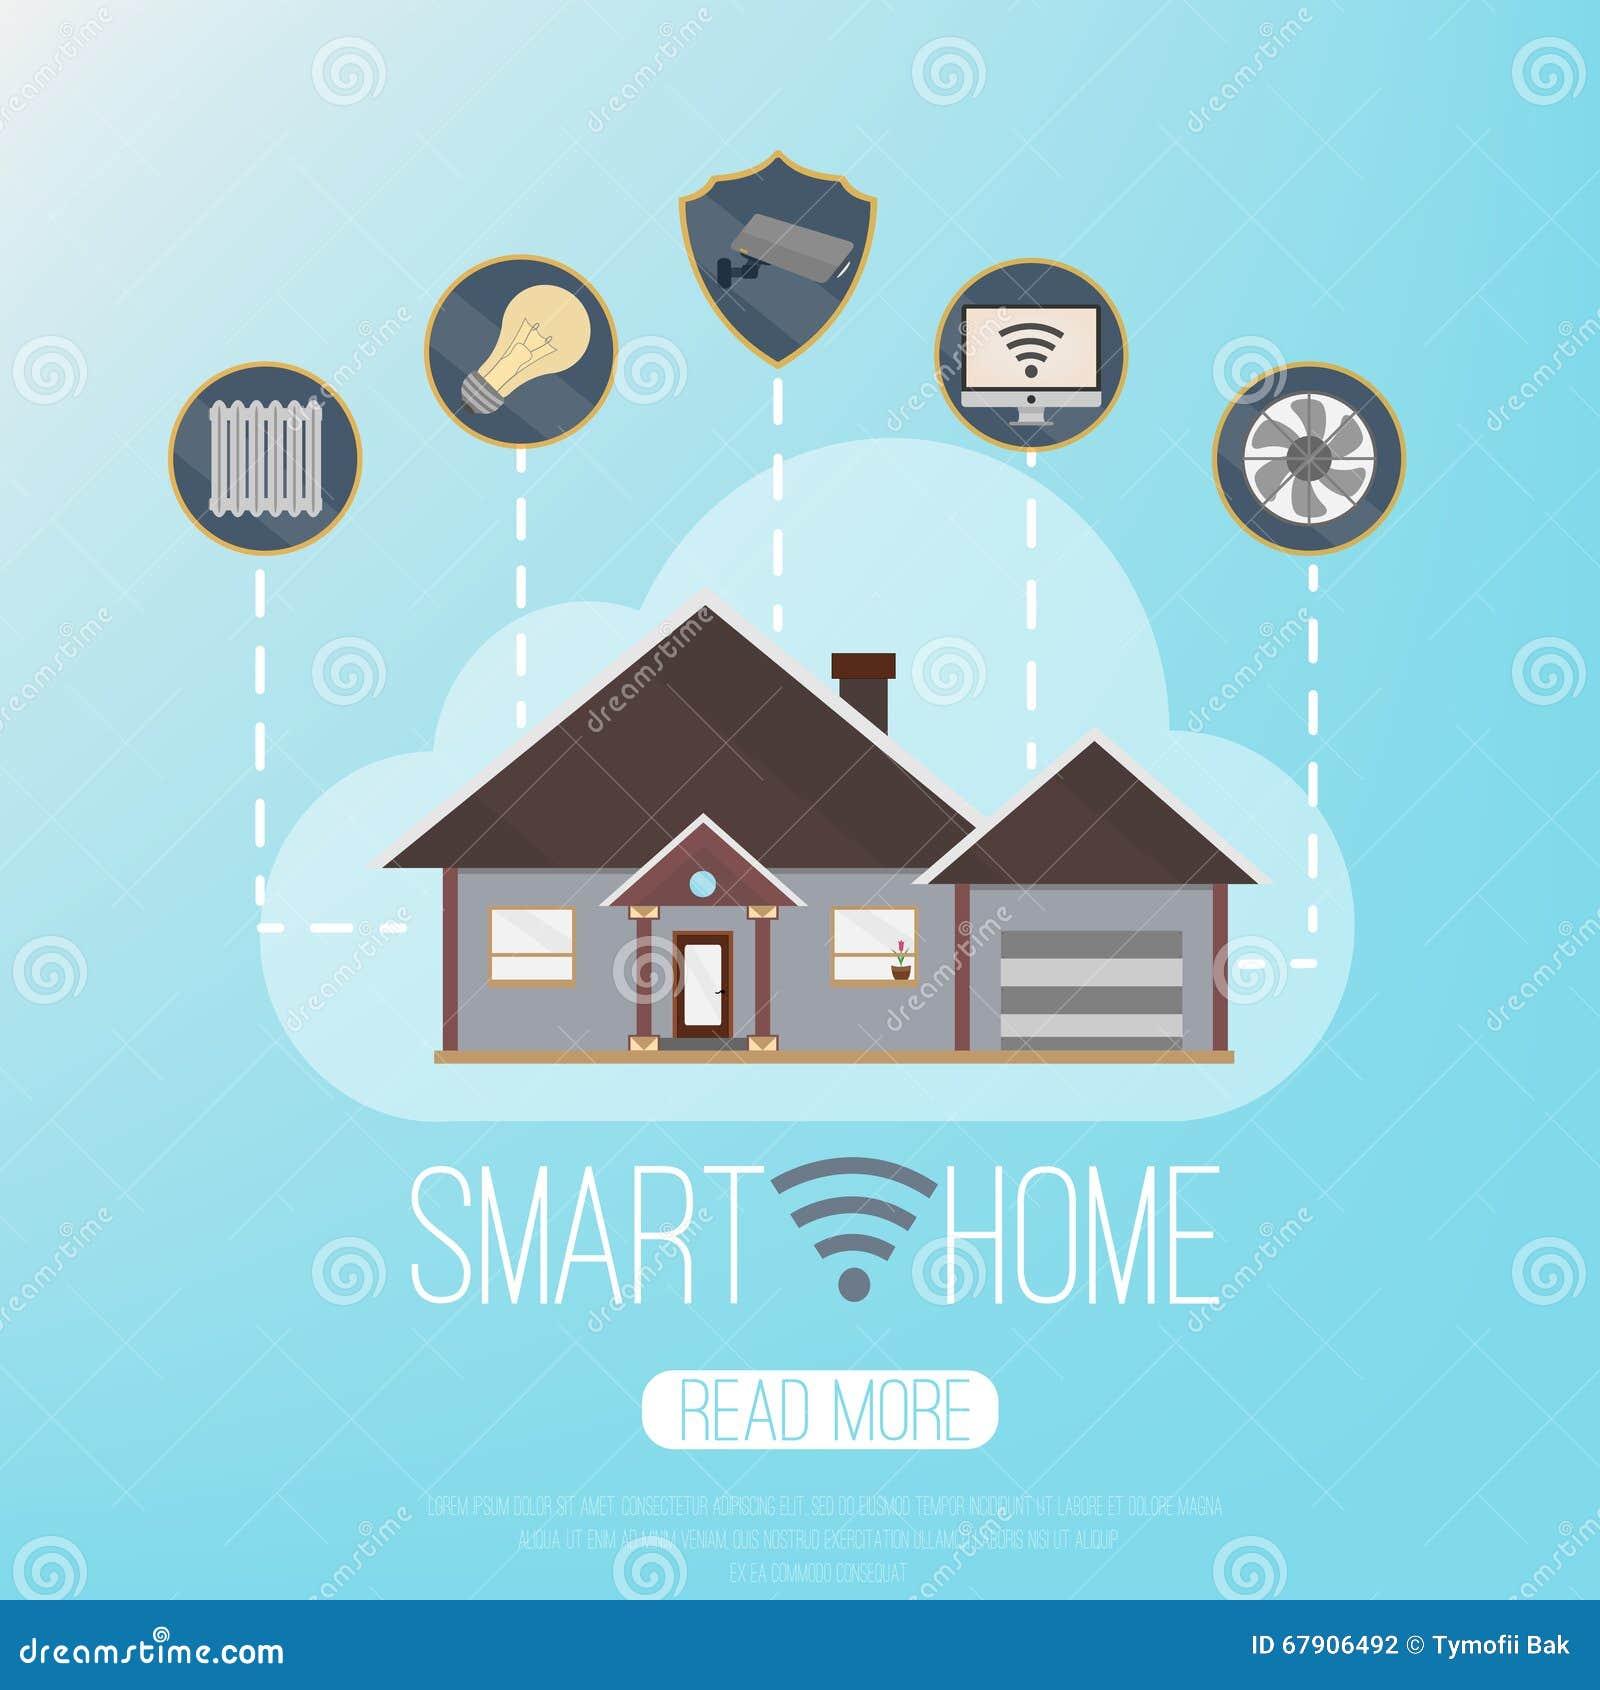 Smart Home Technologies: Smart Home. Vector Illustrarion ,concept,banner Of Smart